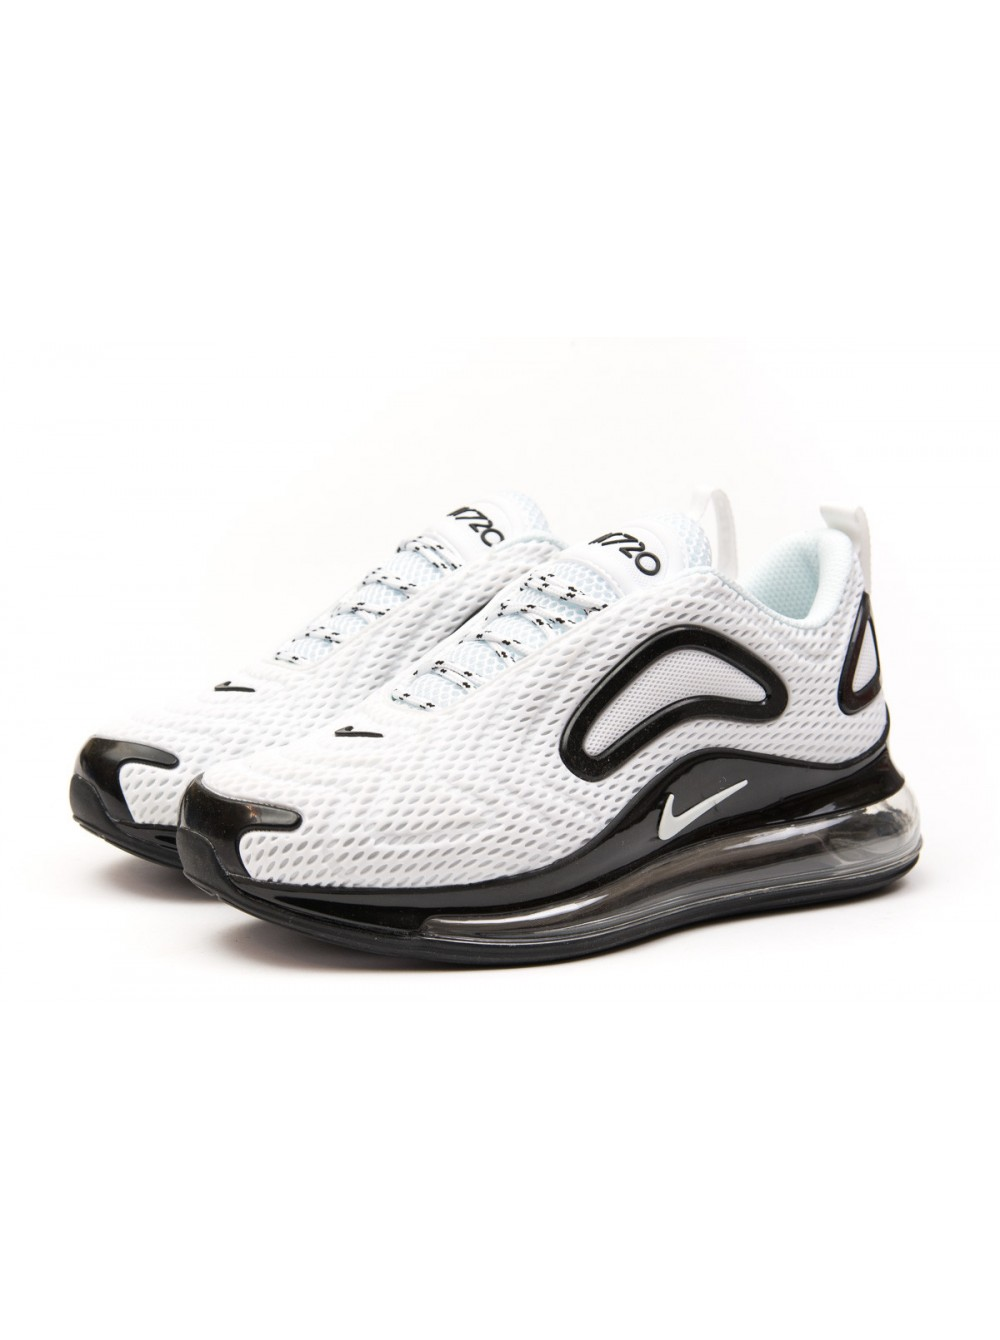 e37e8ee7 Купить кроссовки Nike Air Max 720 мужские белые | KED.NET.UA